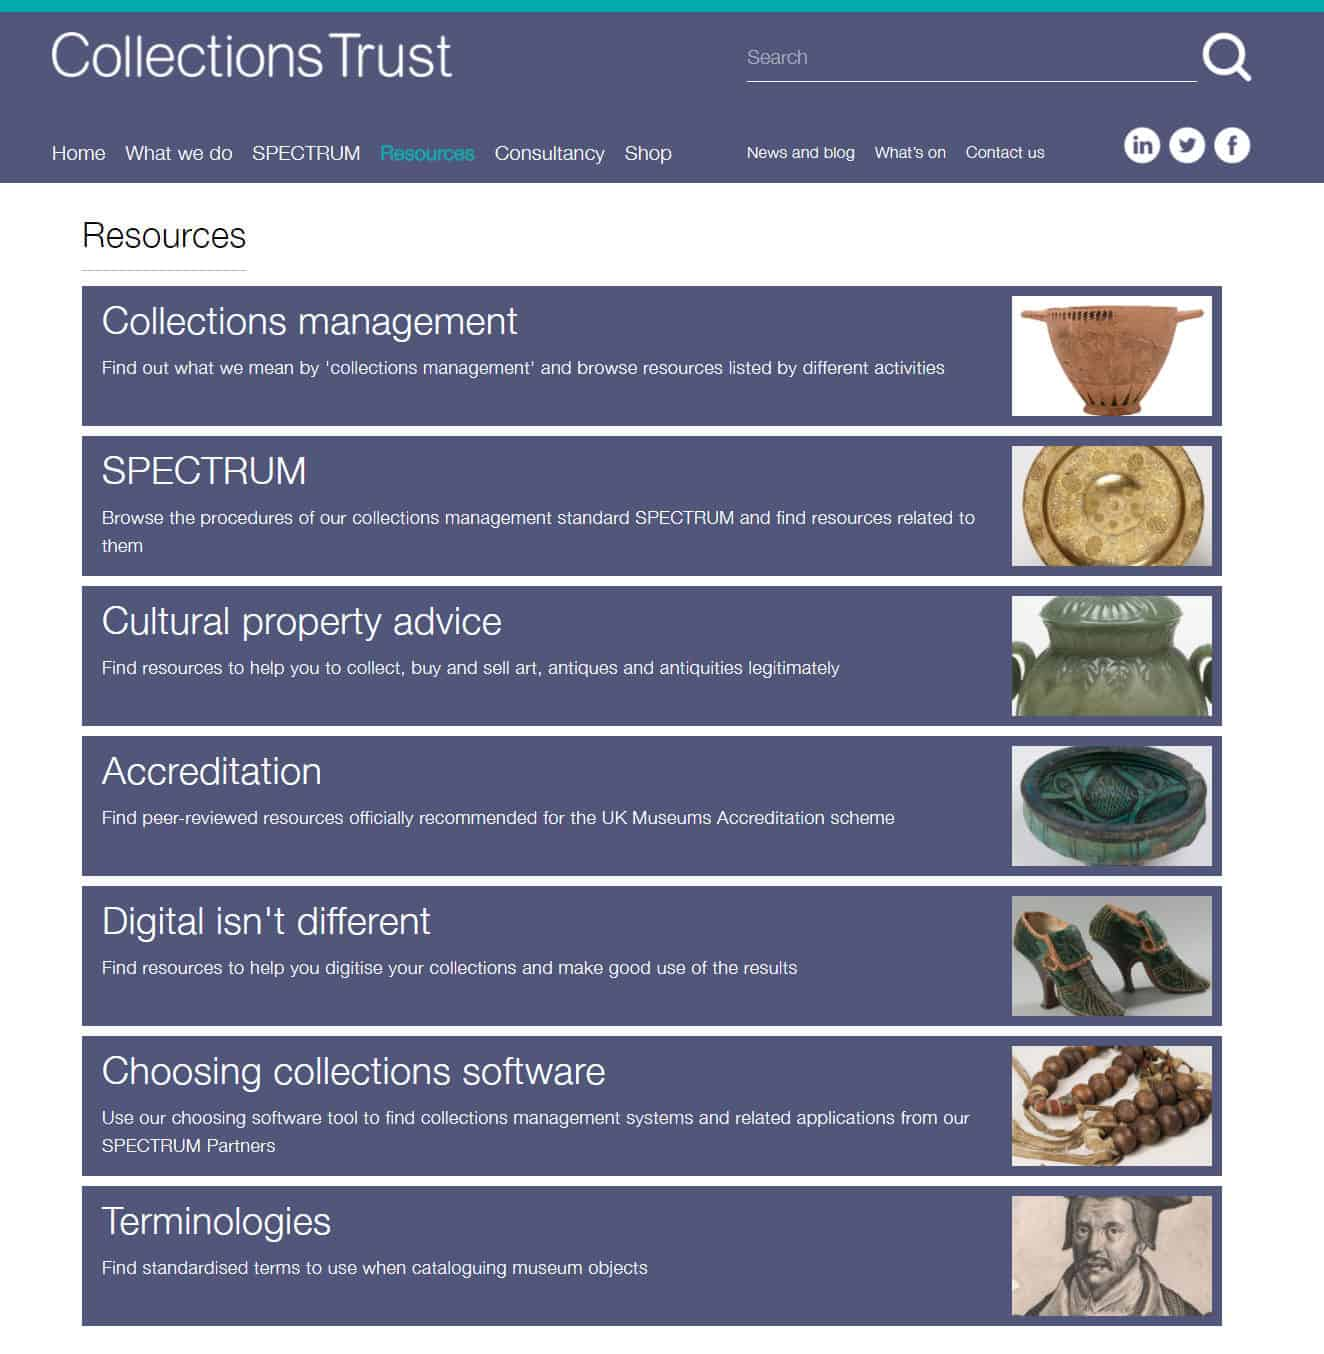 Screenshot of Collections Trust website - Resources